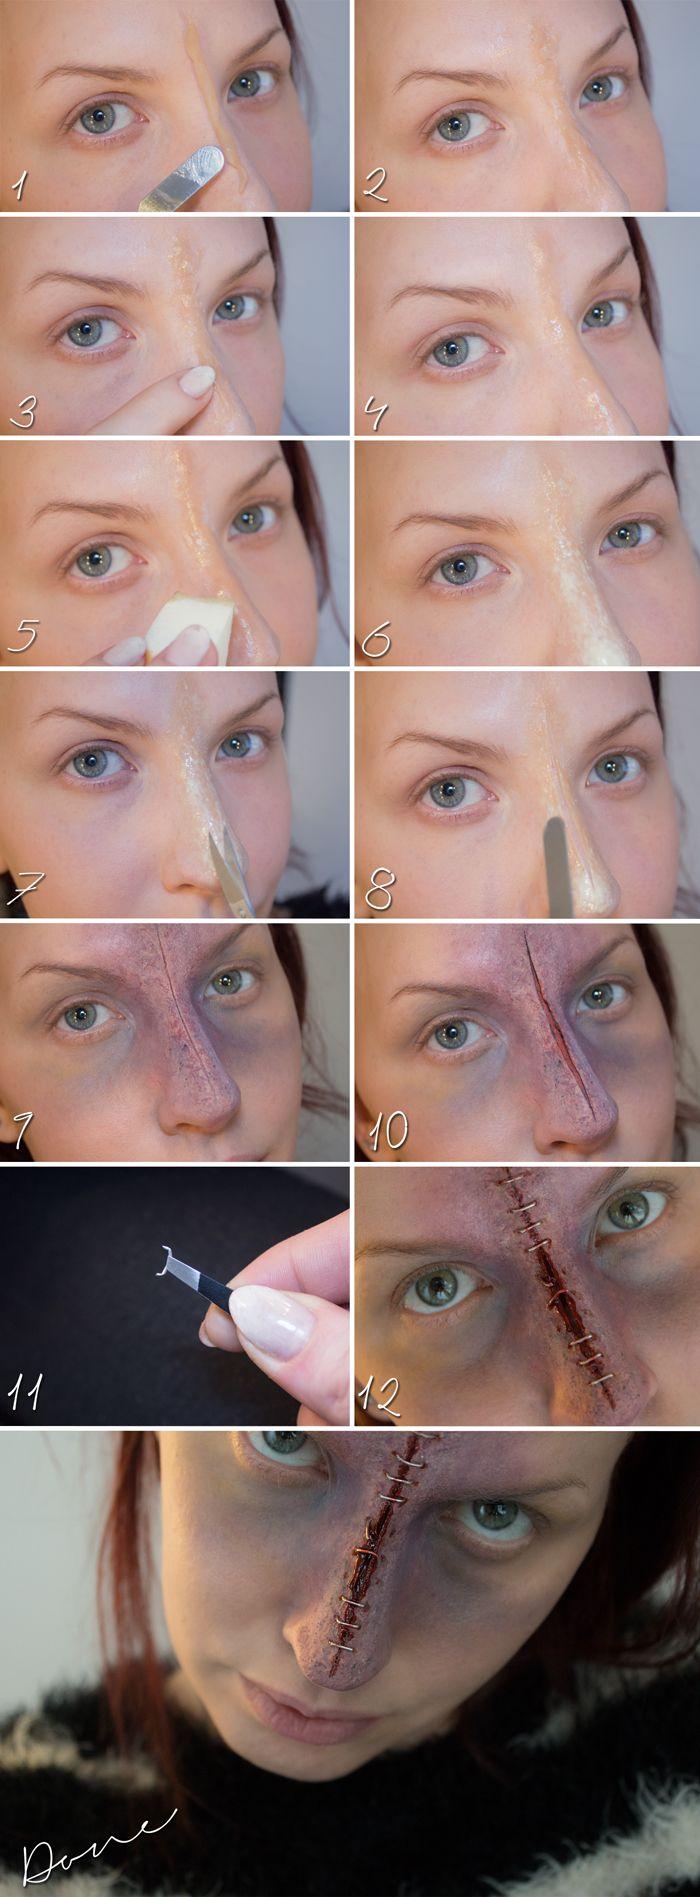 #Halloween #inspiração #inspiration #inspiración #ideas #ideias #joiasdolar  #tutorials #makeup